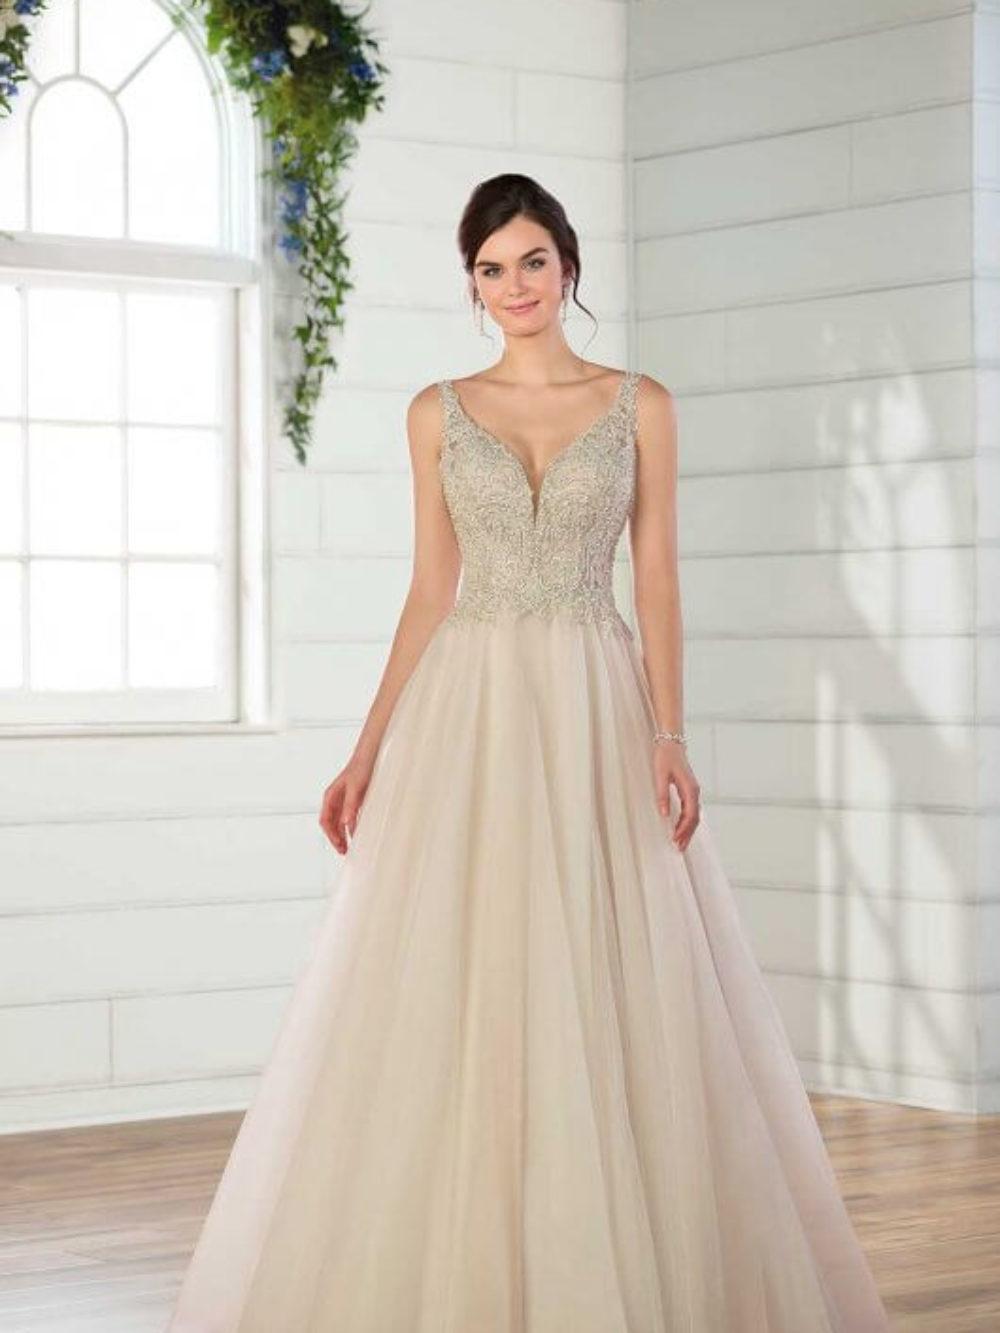 Justin Alexander Wedding Dresses from Precious Memories Bridal Shop